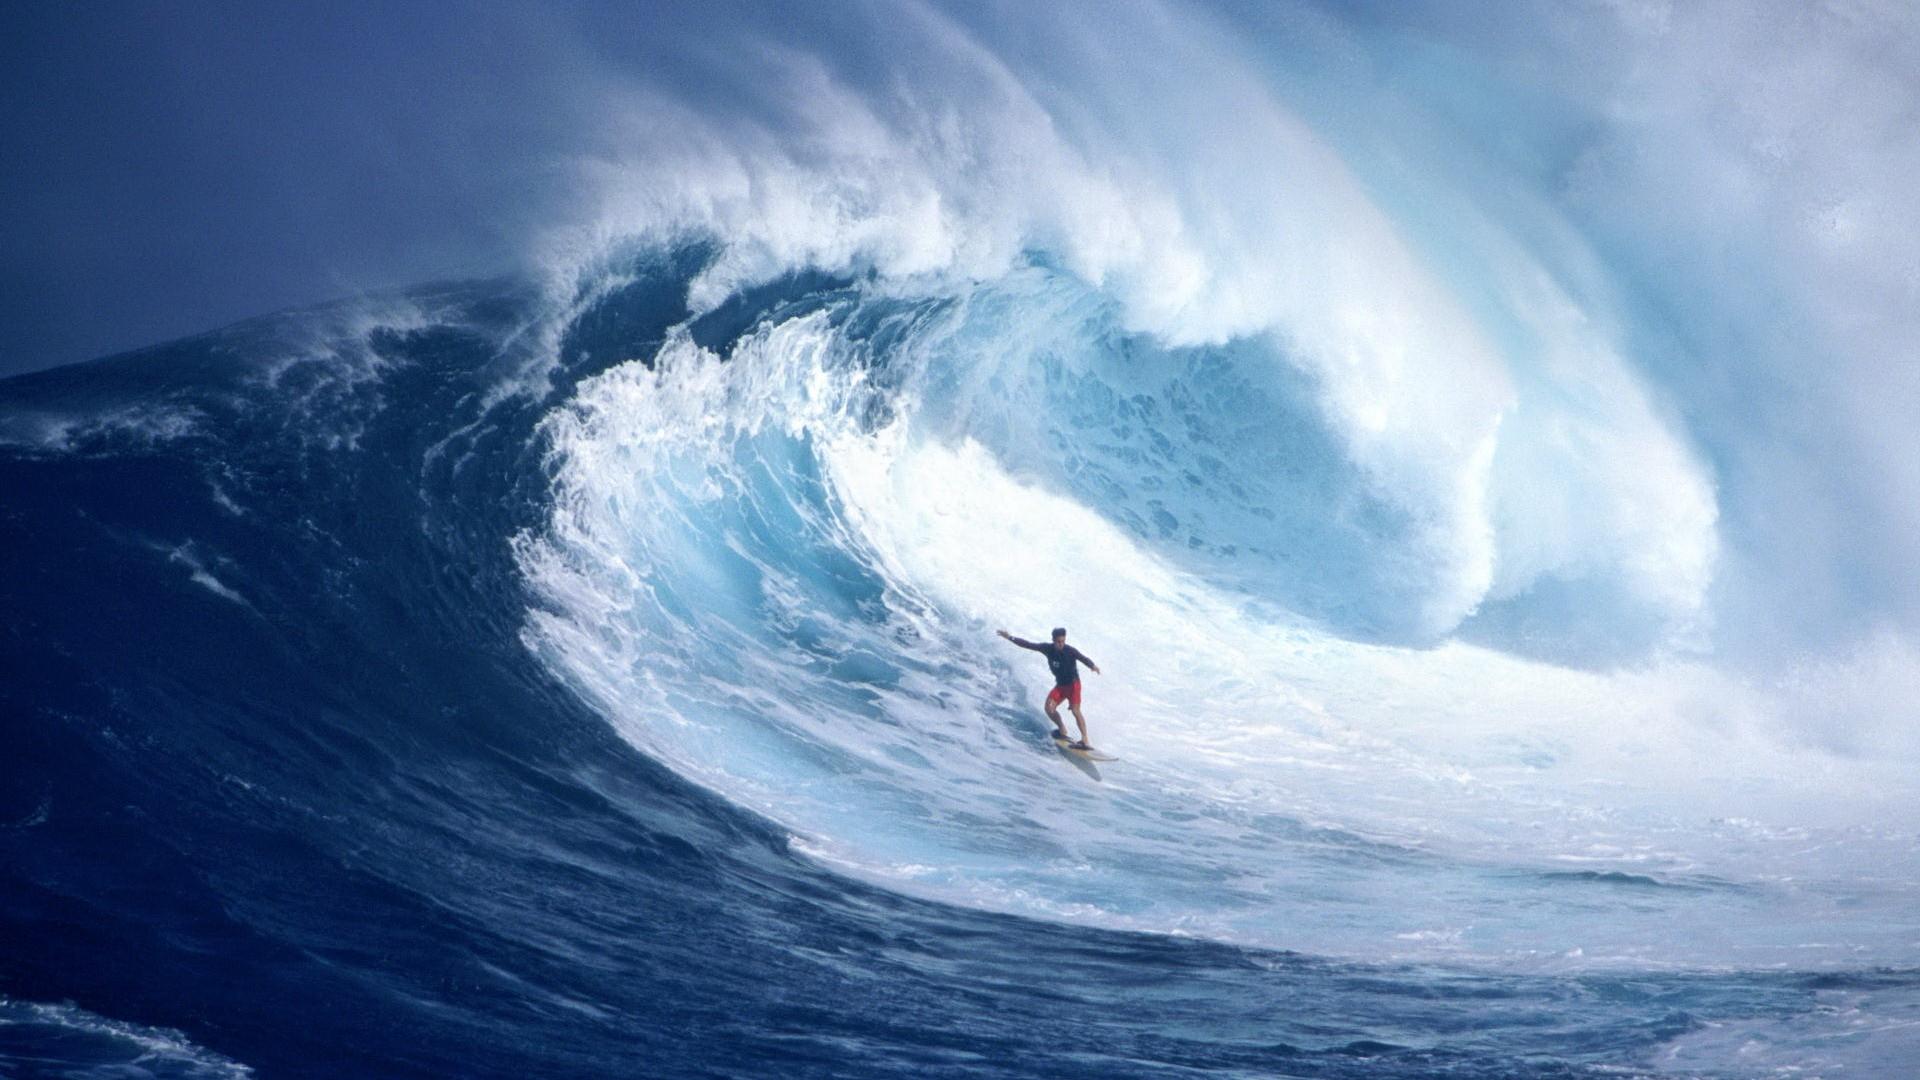 Surf Wallpaper Hd wallpaper - 637761